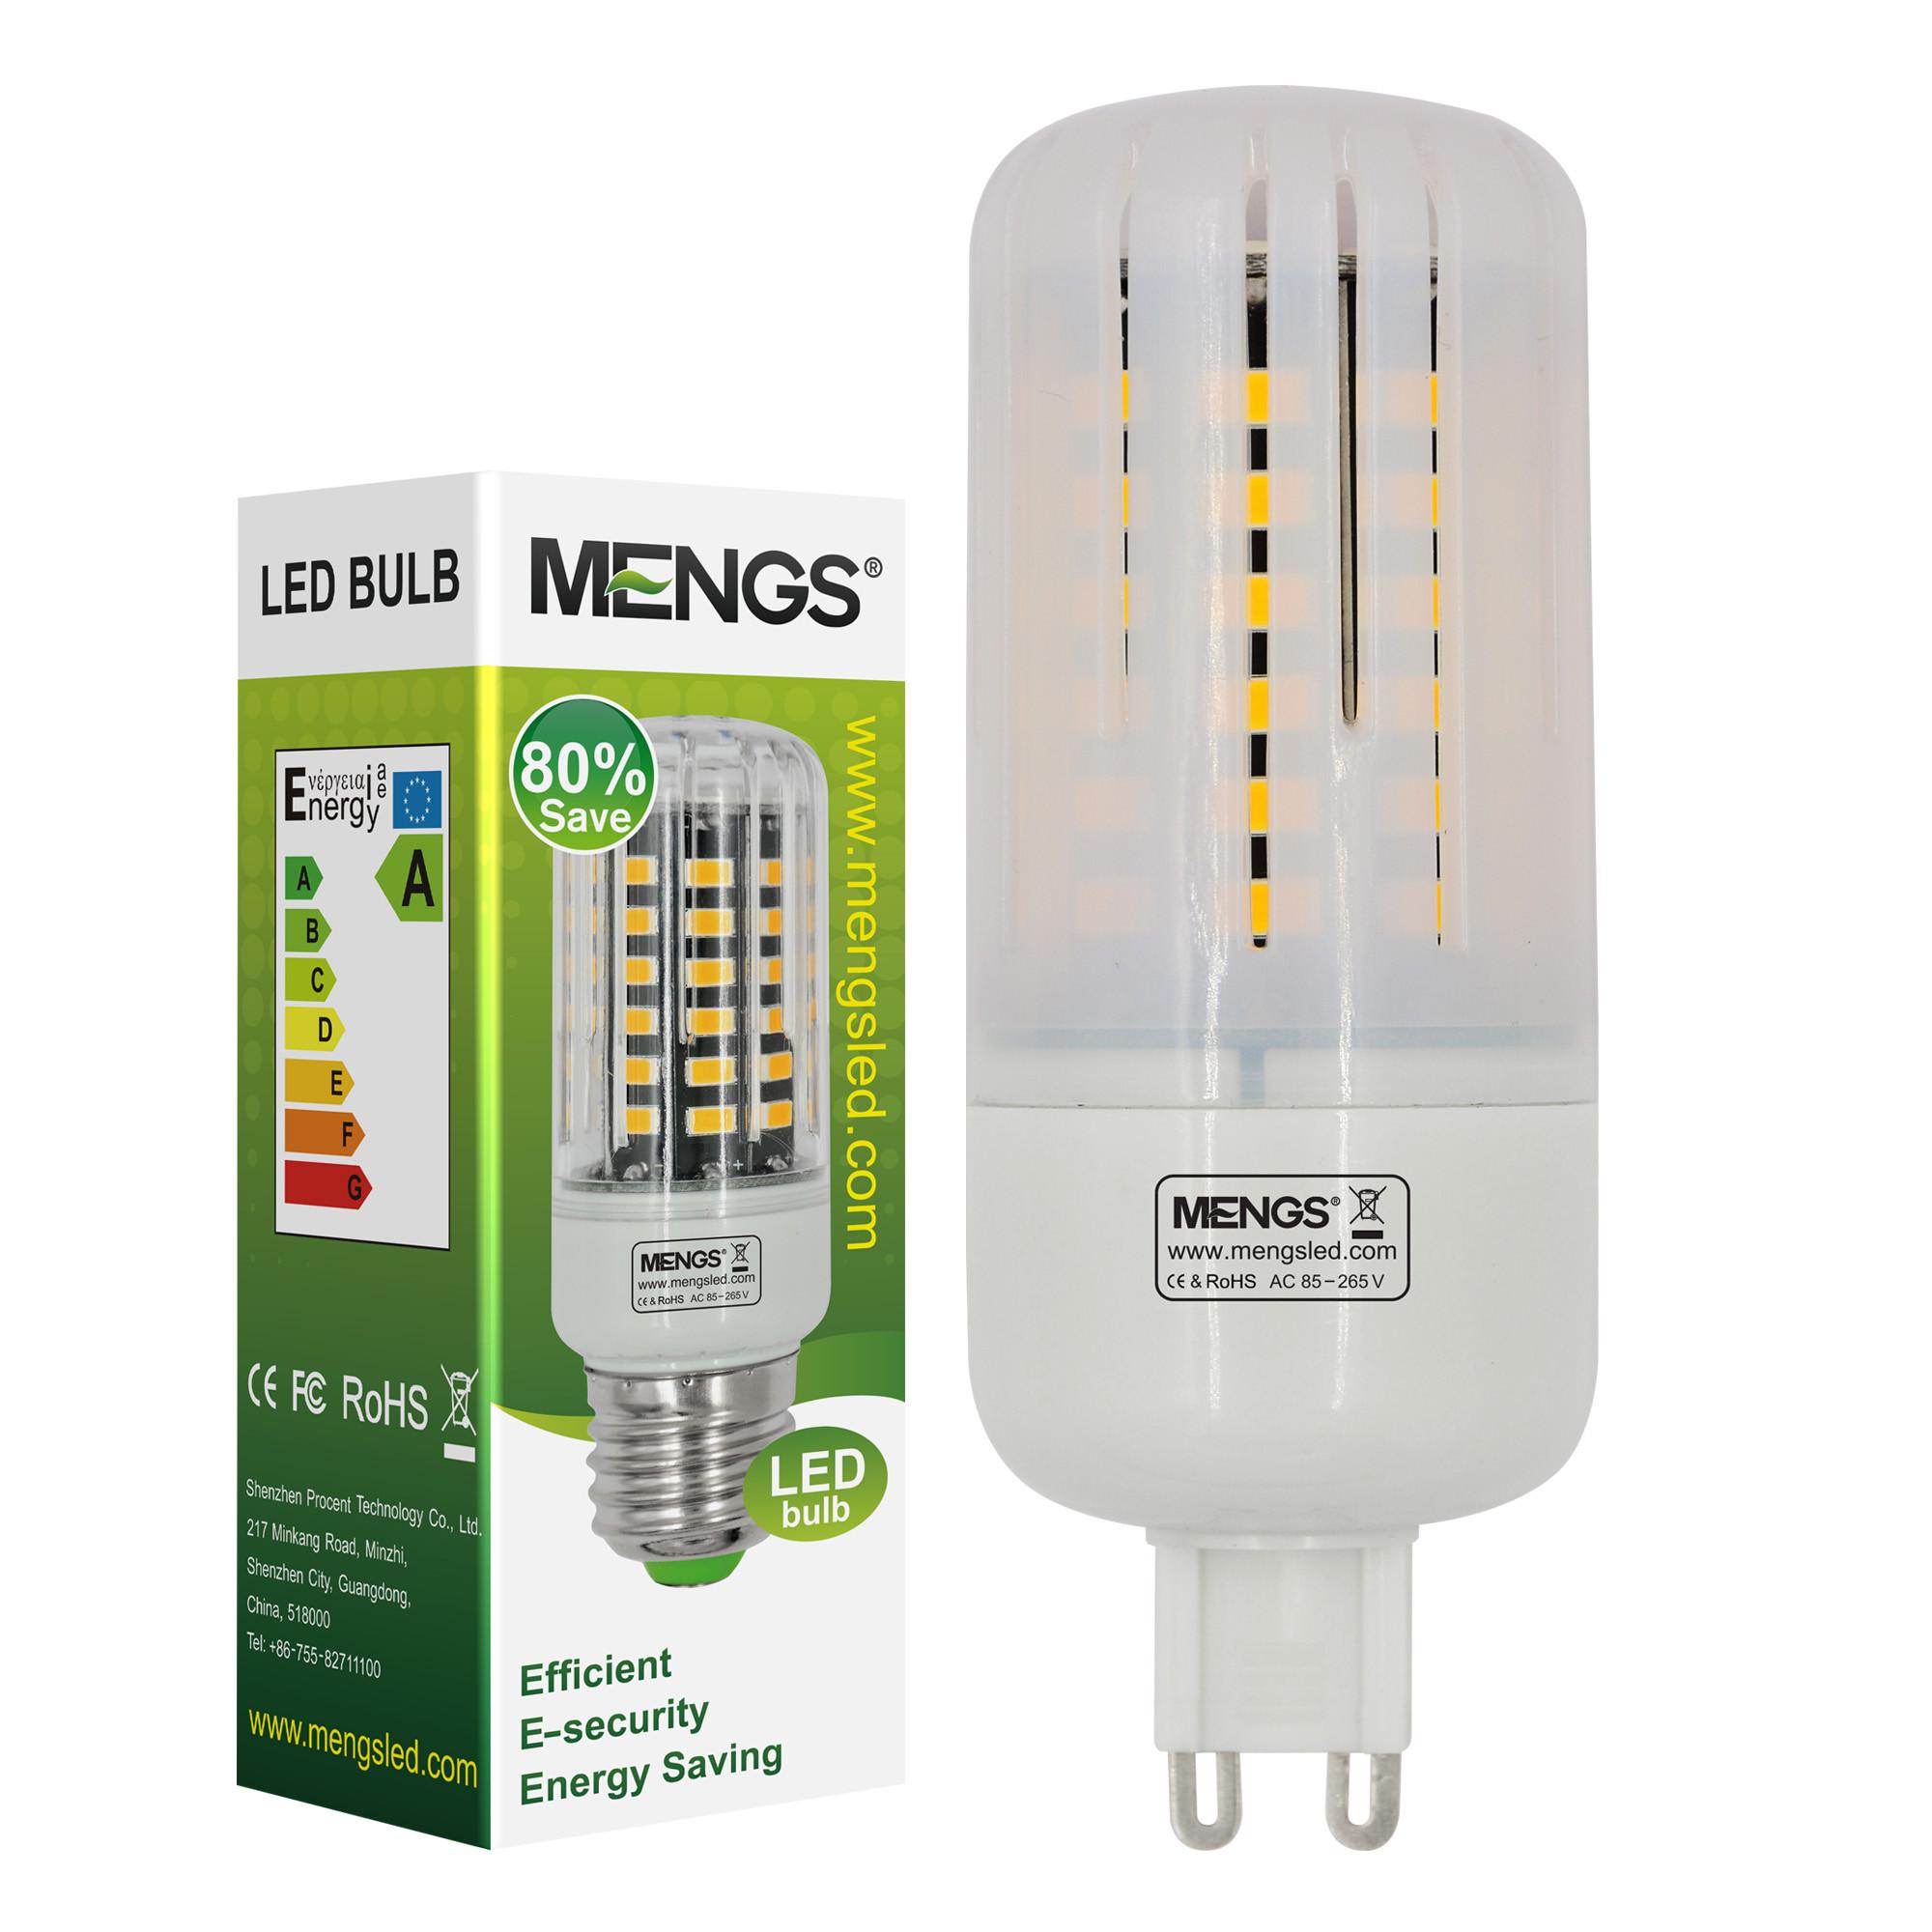 anti strobe g9 7w led corn light 56x 5736 smd lb led bulb lamp in cool white energy saving lamp. Black Bedroom Furniture Sets. Home Design Ideas